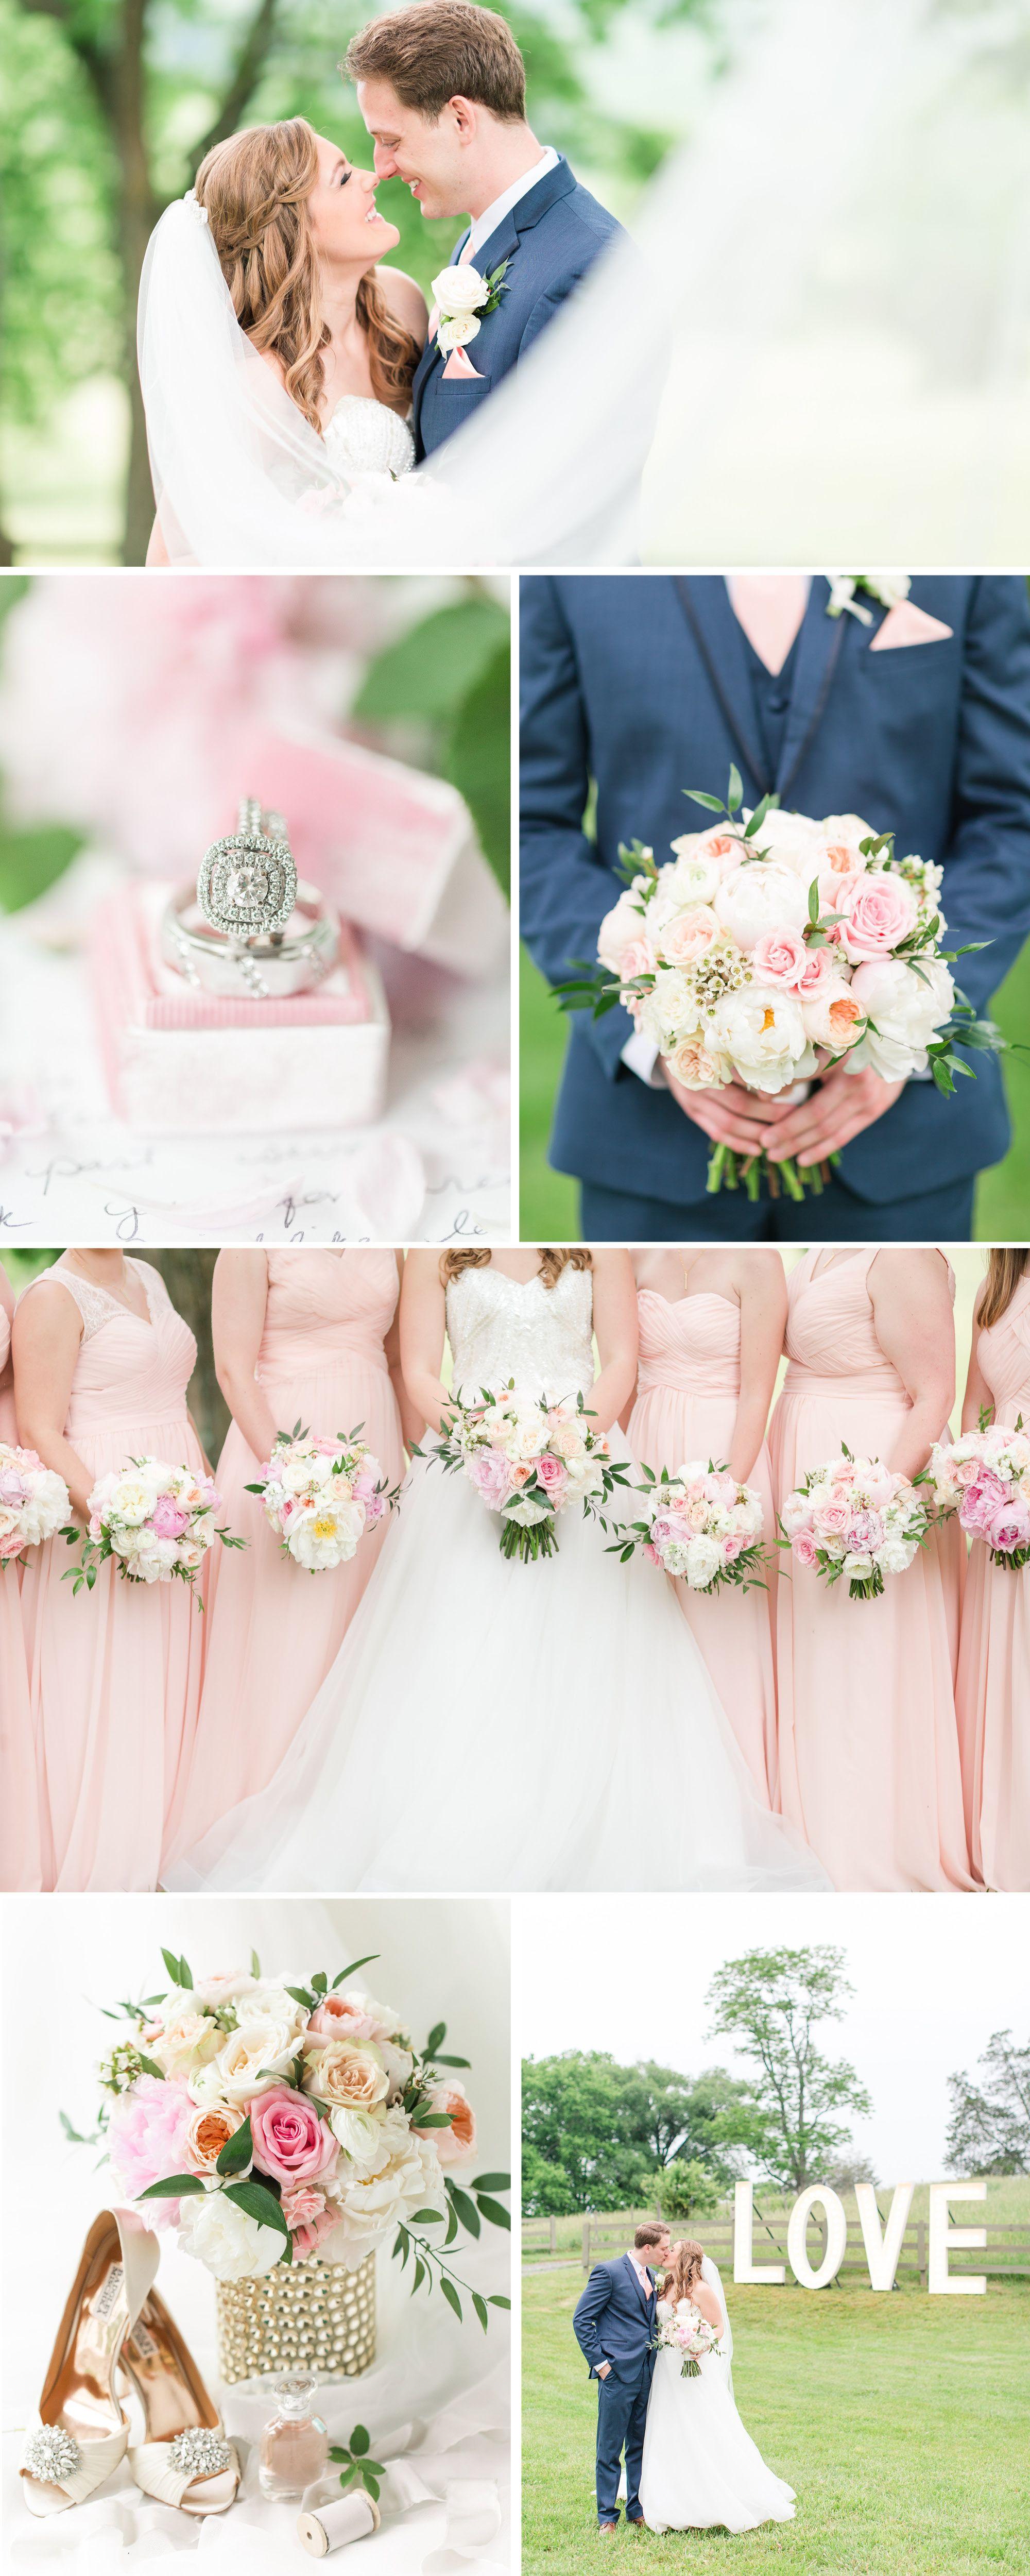 a blush navy inspired spring wedding at big spring farm in